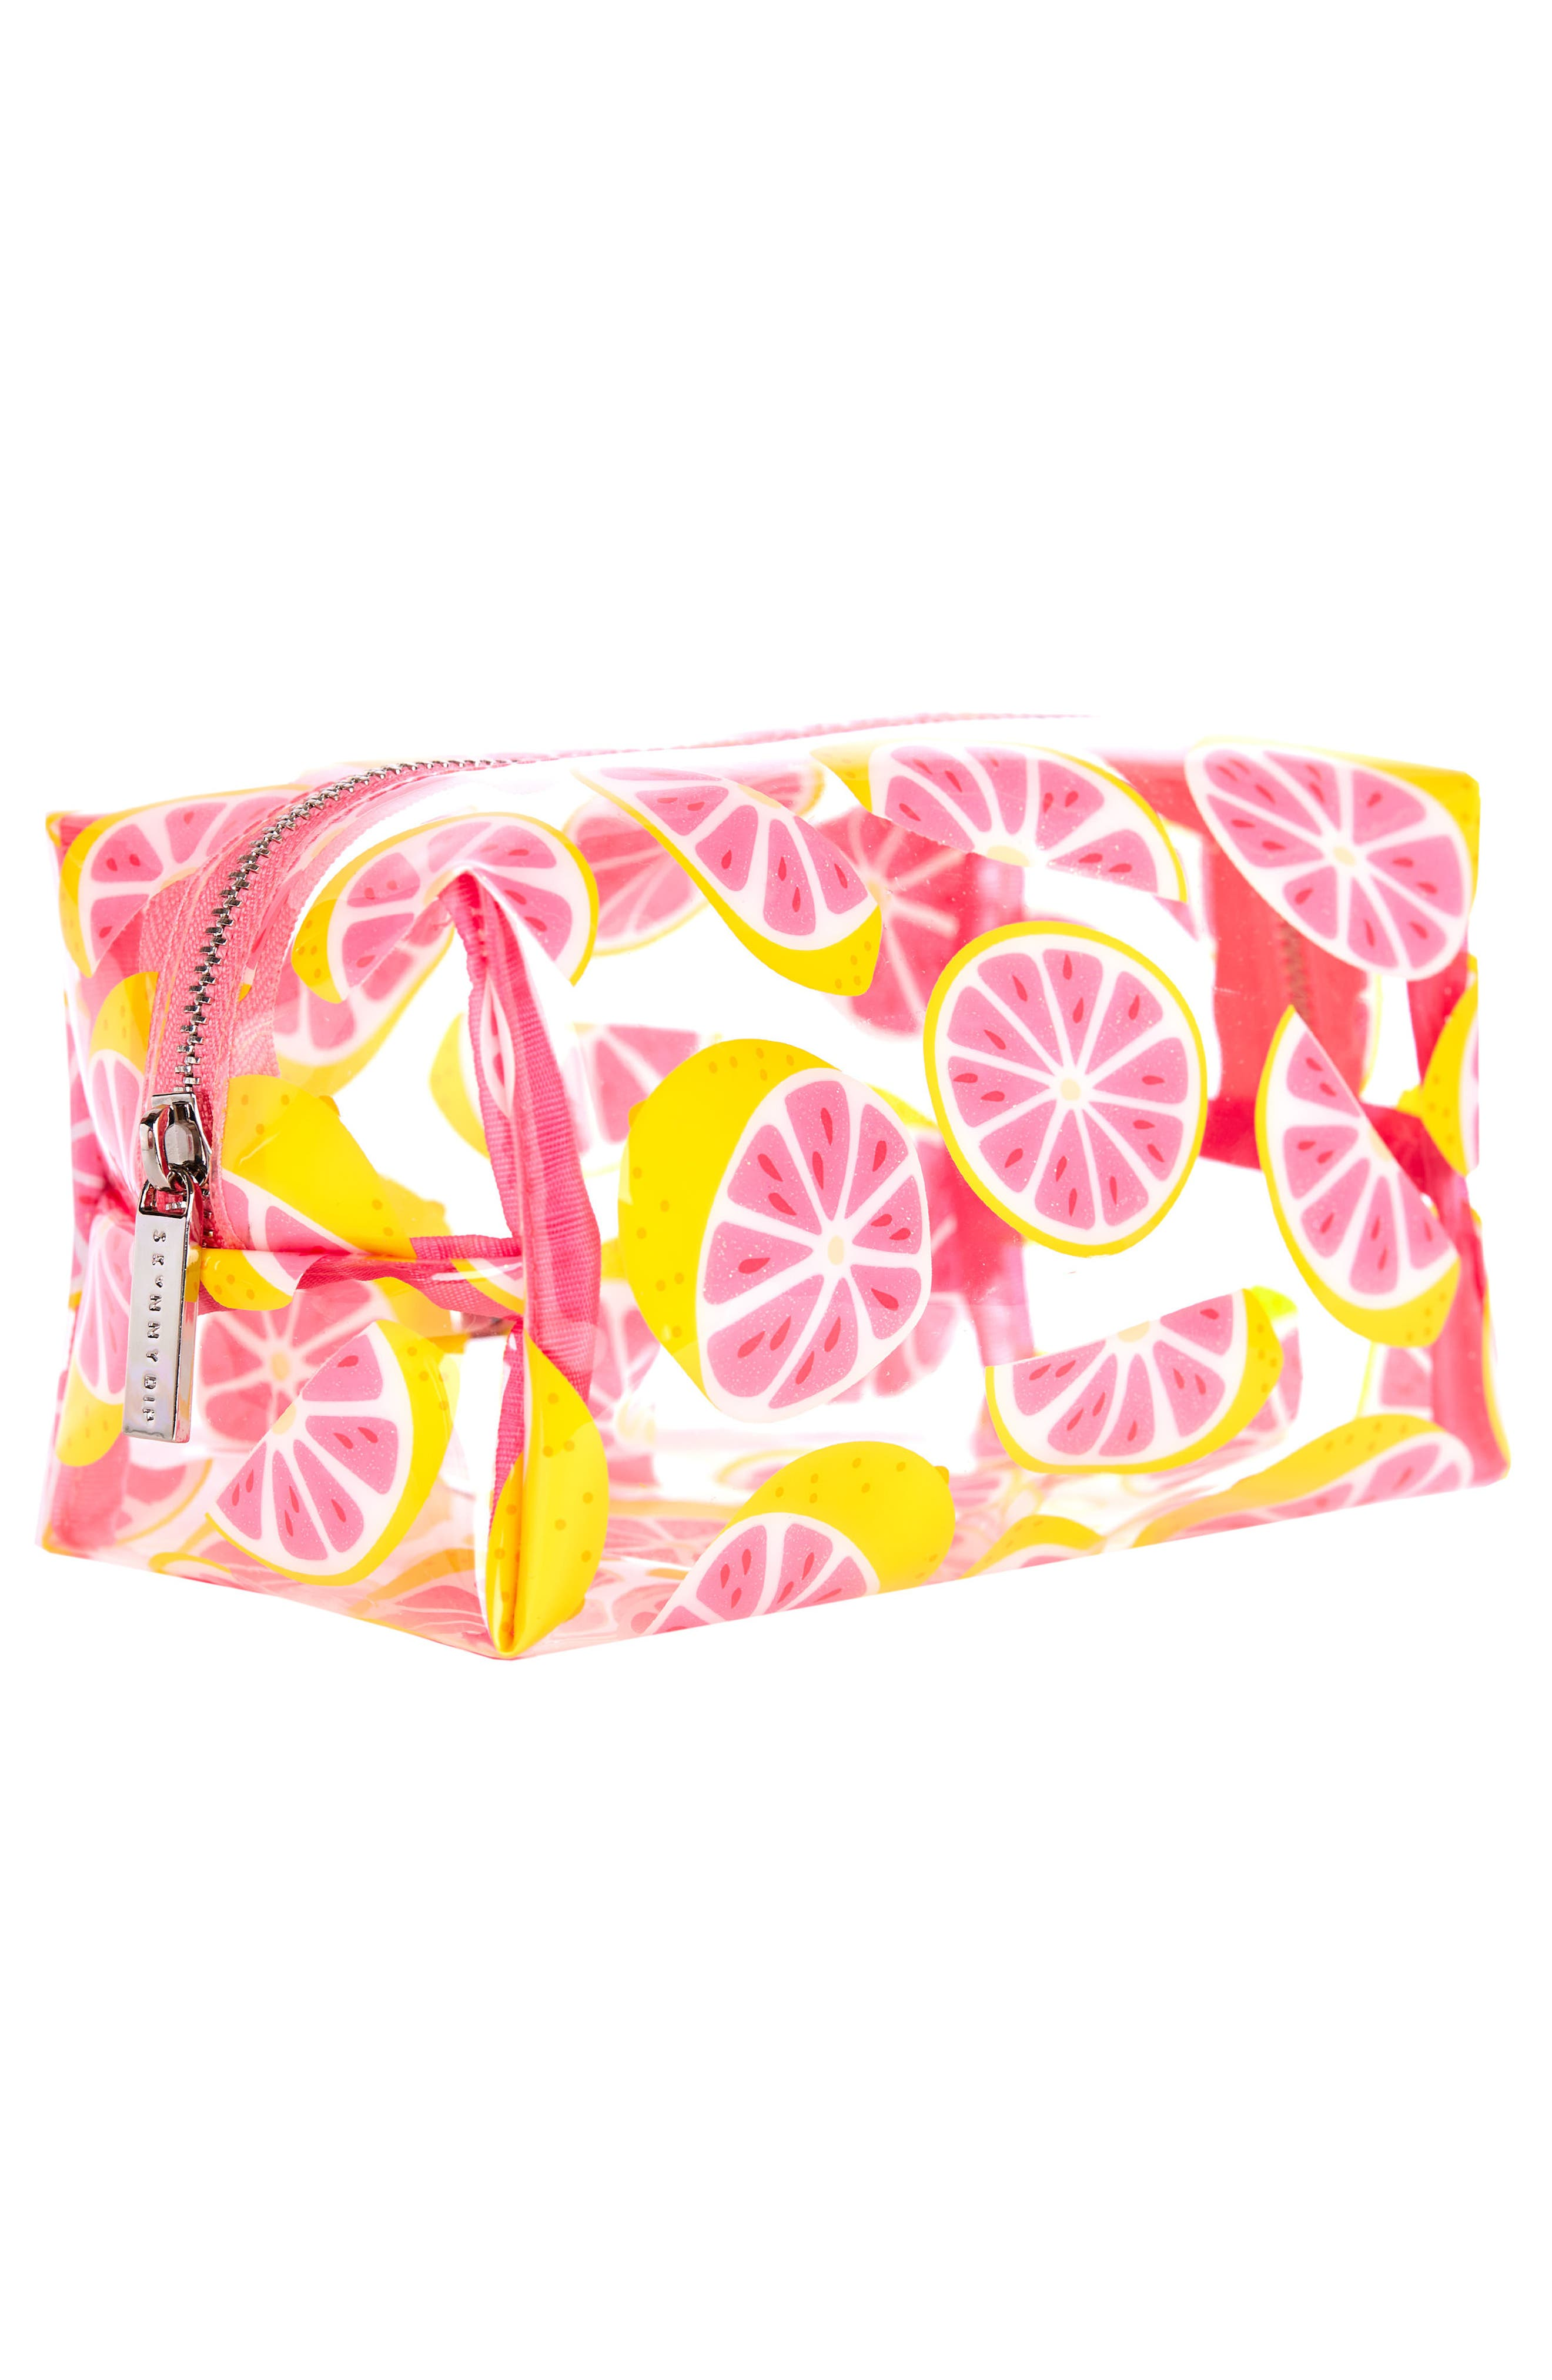 Skinny Dip Glitter Grapefruit Cosmetics Case,                             Alternate thumbnail 2, color,                             NO COLOR